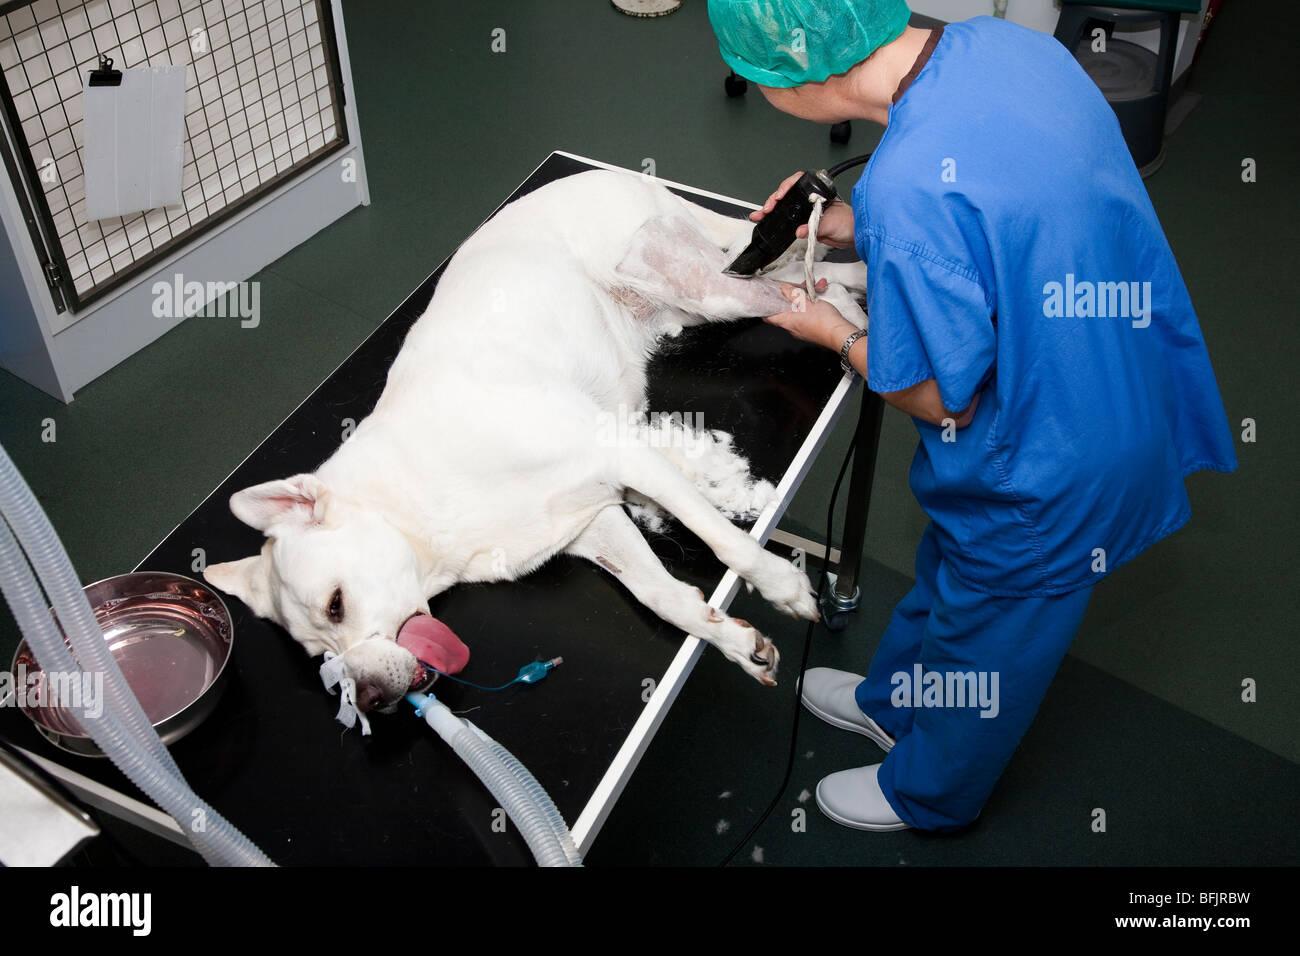 Veterinary Nurse Preparing a Dog for Hindlimb Surgery - Stock Image